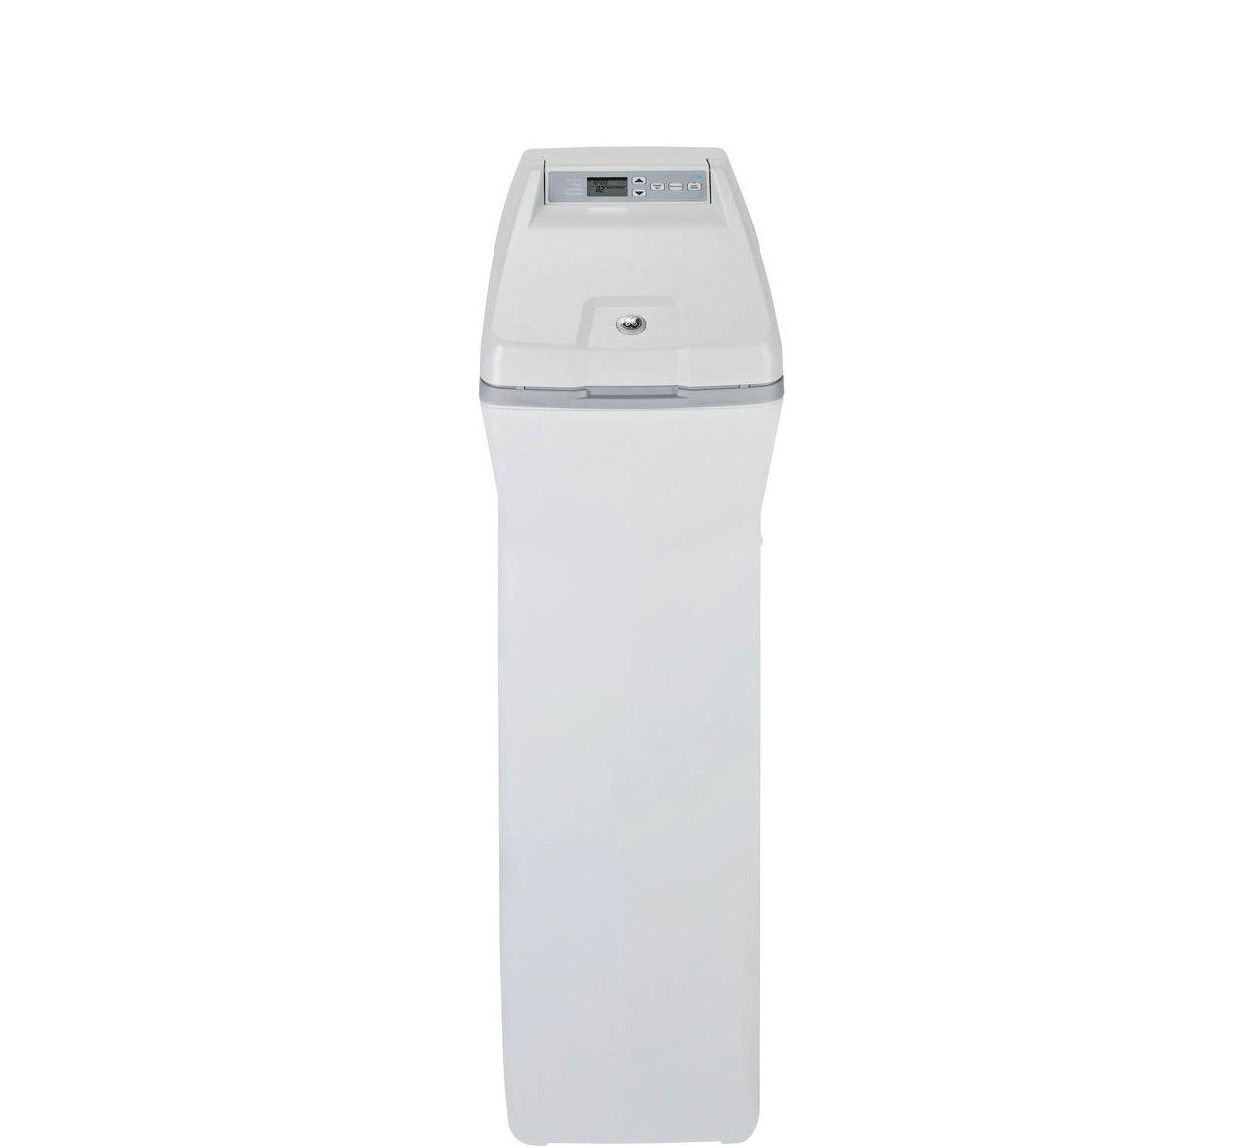 GE GXSH40V Water Softener